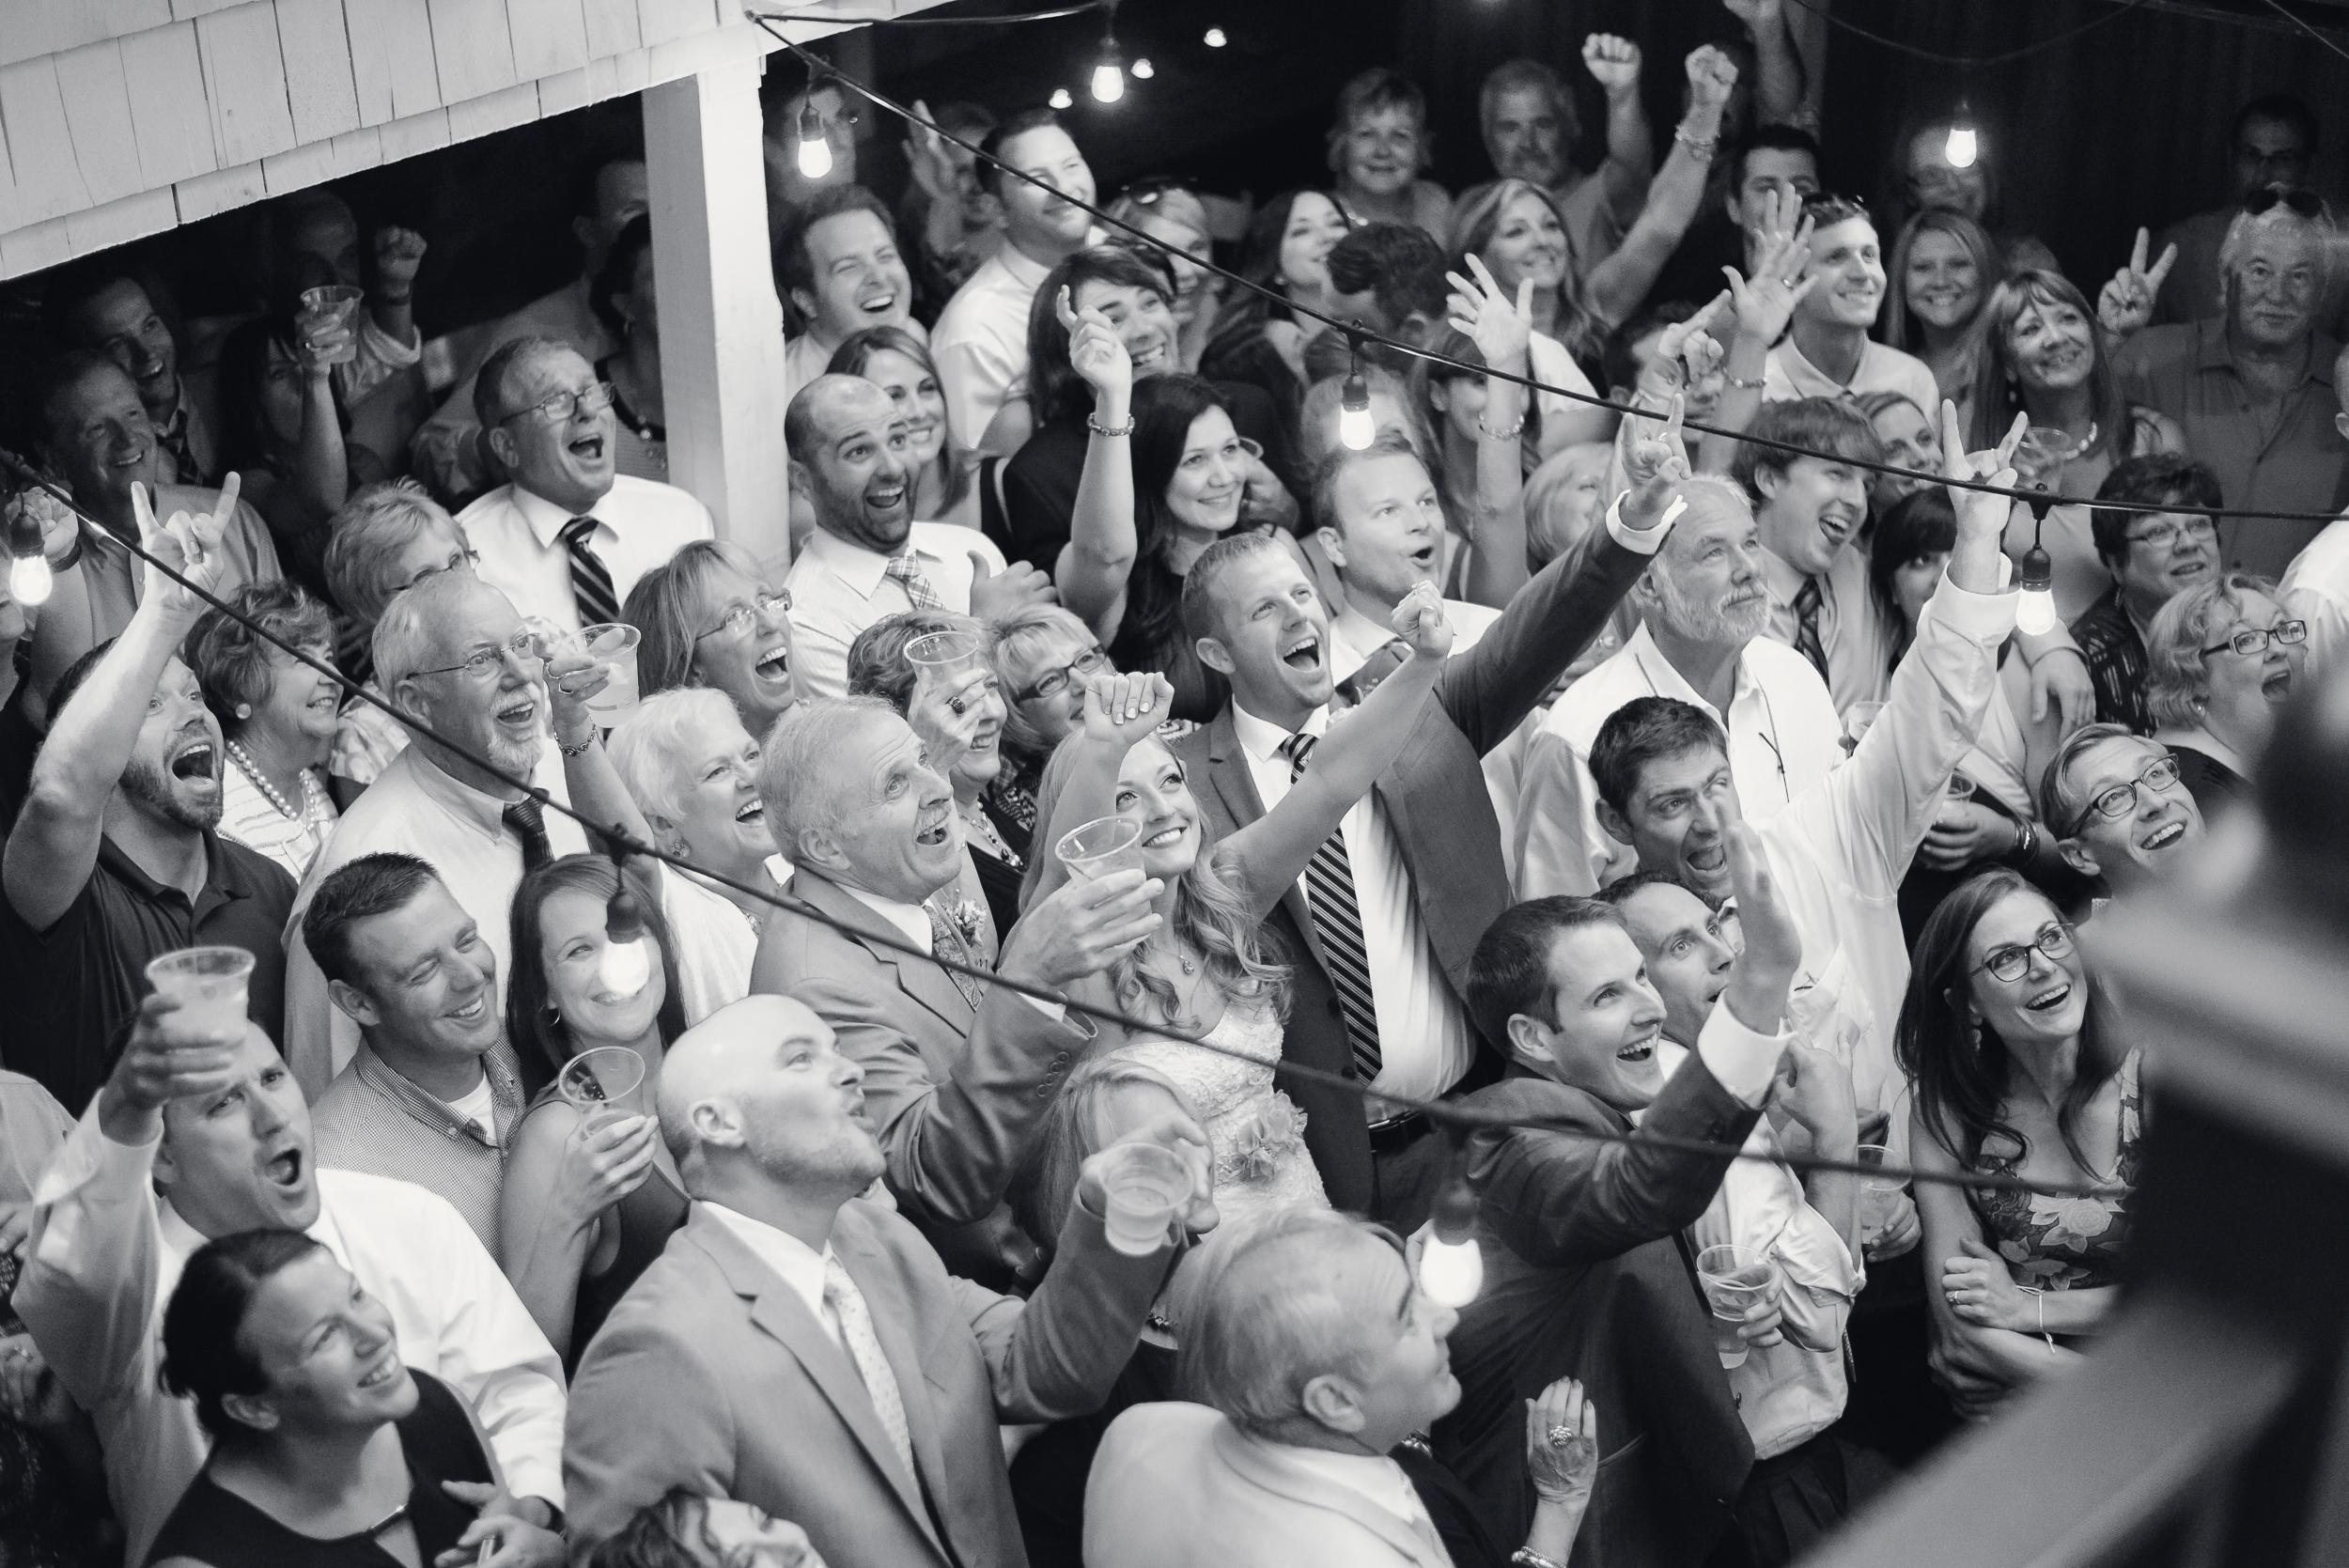 willowbrook-mill-northport-michigan-leelanau-peninsula-wedding-photo-1-23